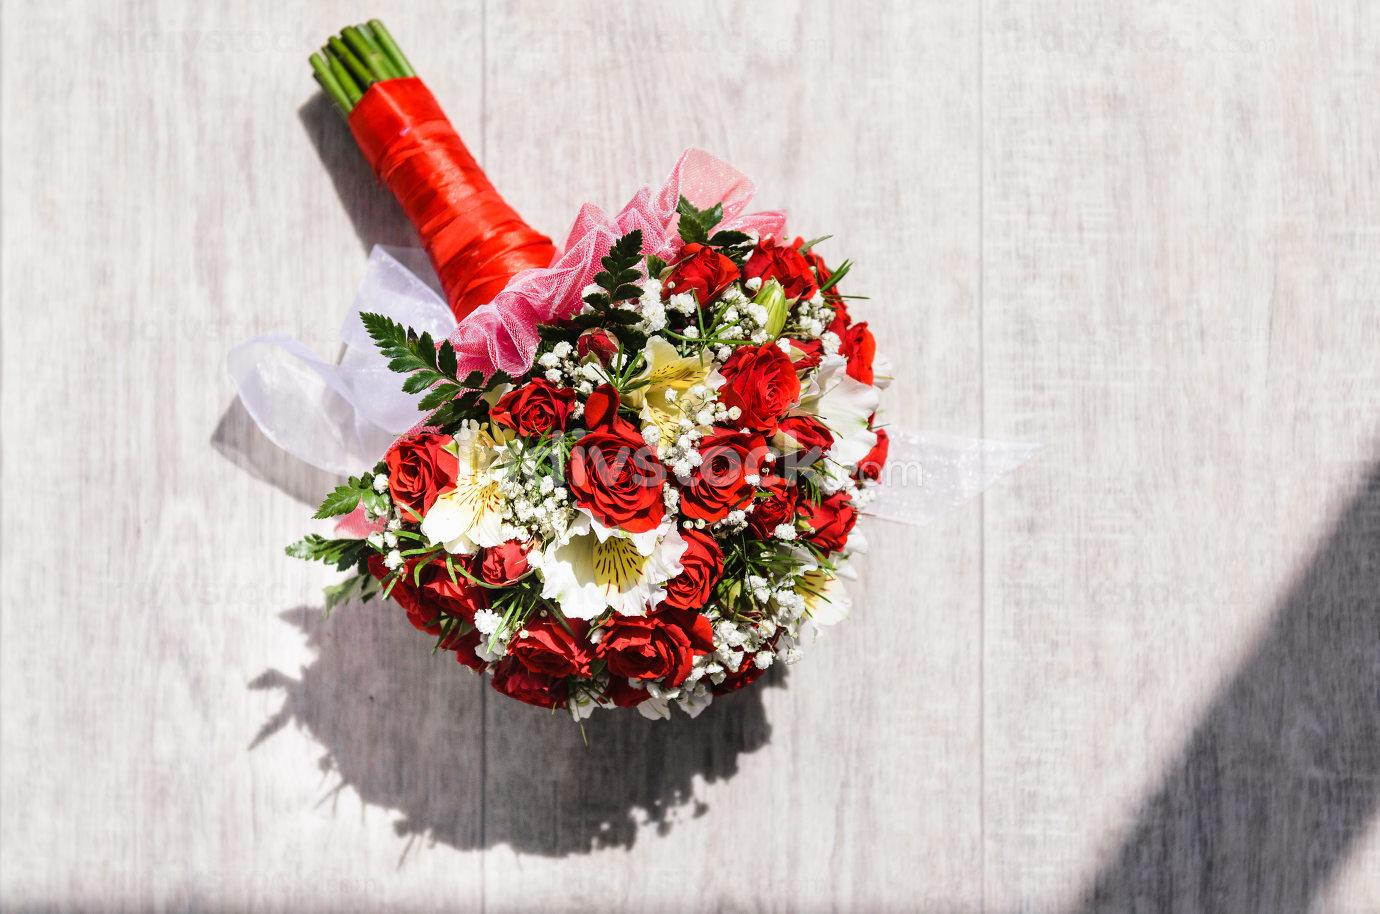 brides bouquet on a vintage wooden floor